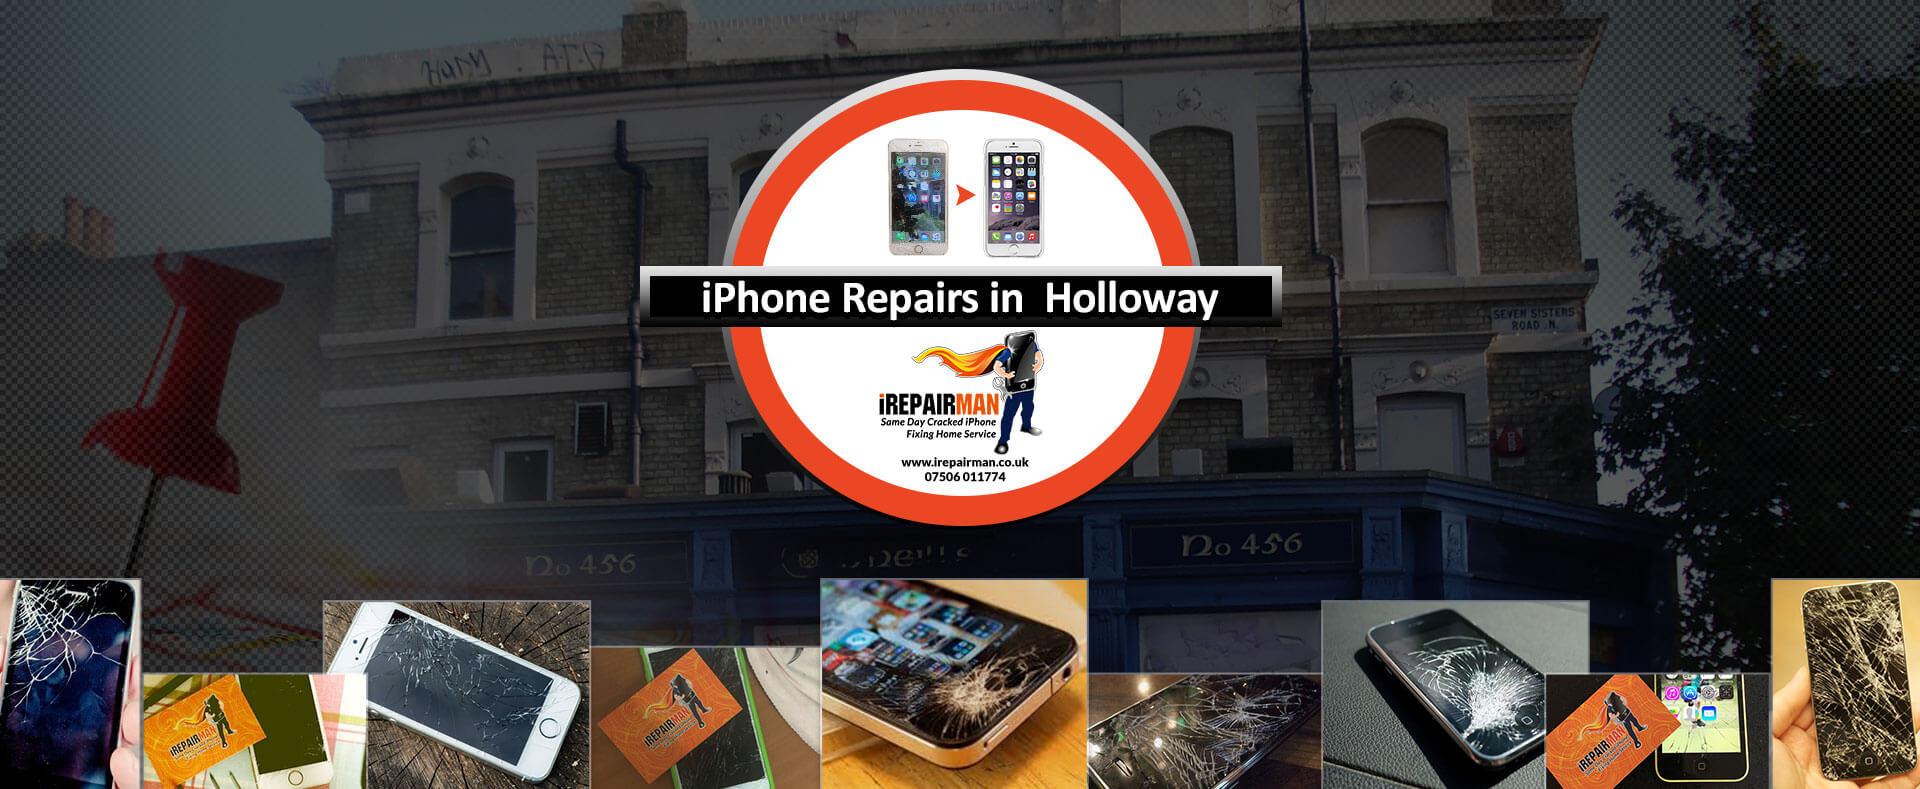 iPhone Repairs in Holloway